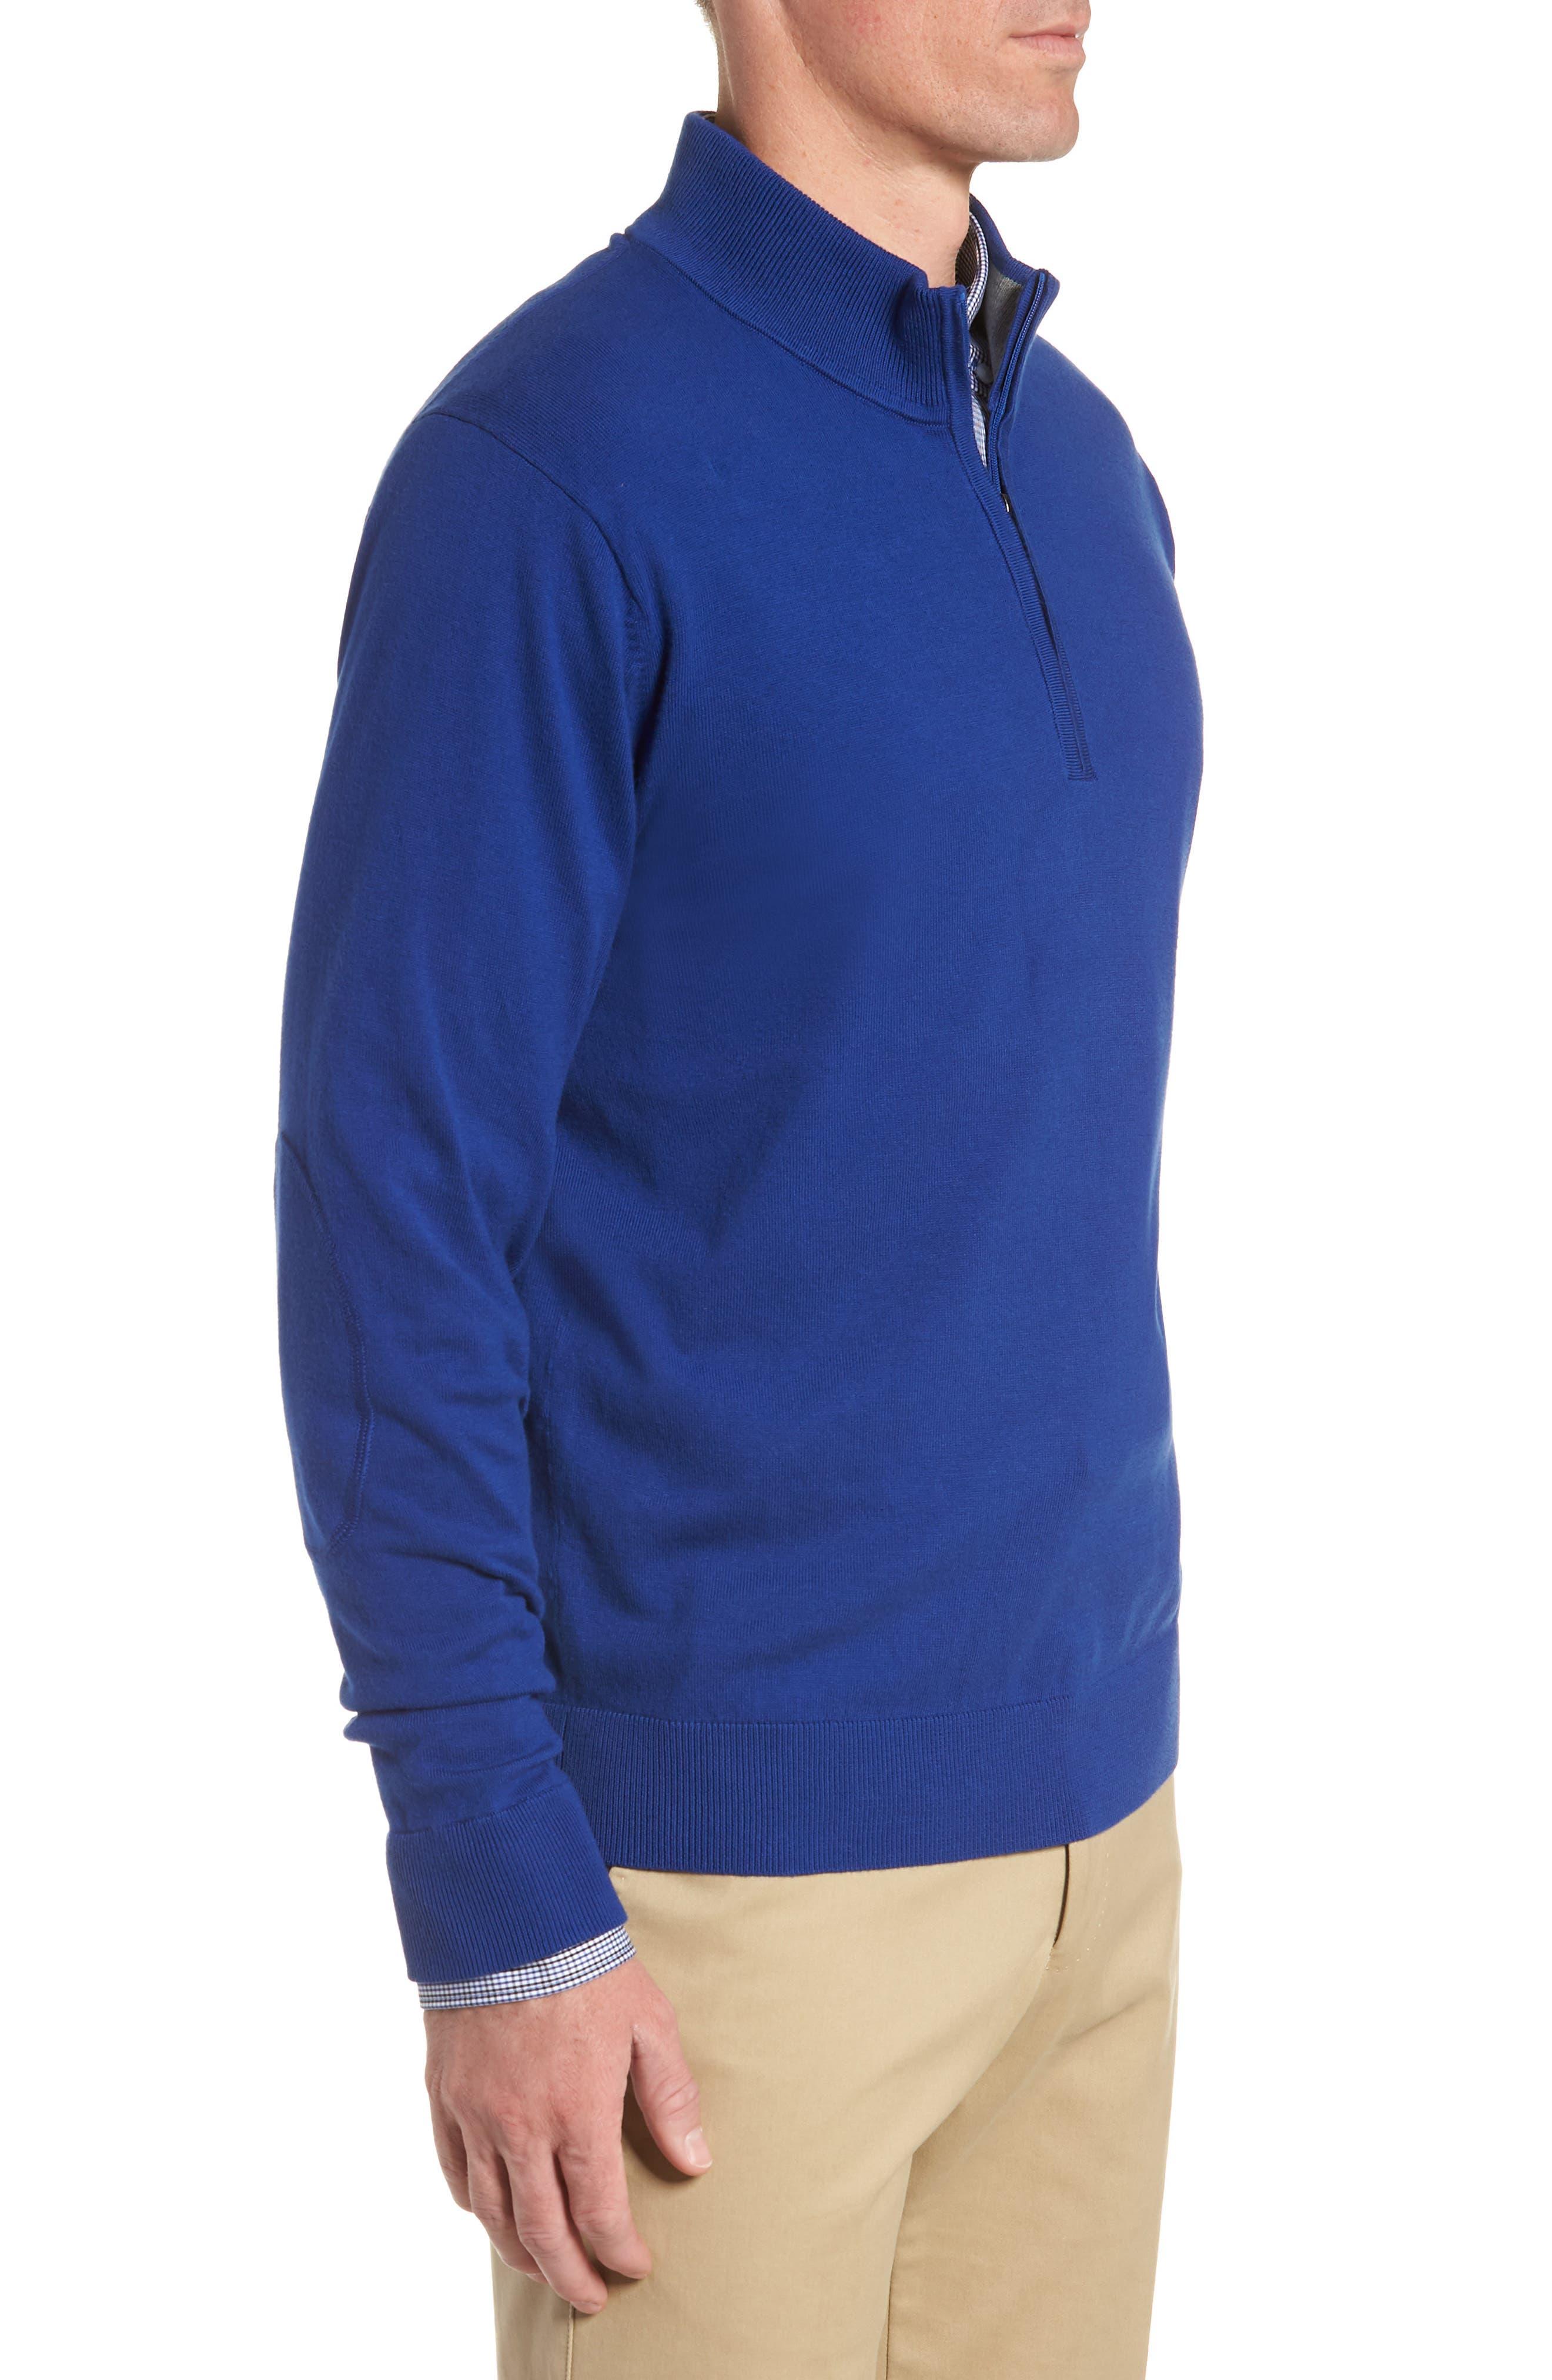 CUTTER & BUCK, Lakemont Half Zip Sweater, Alternate thumbnail 3, color, 419